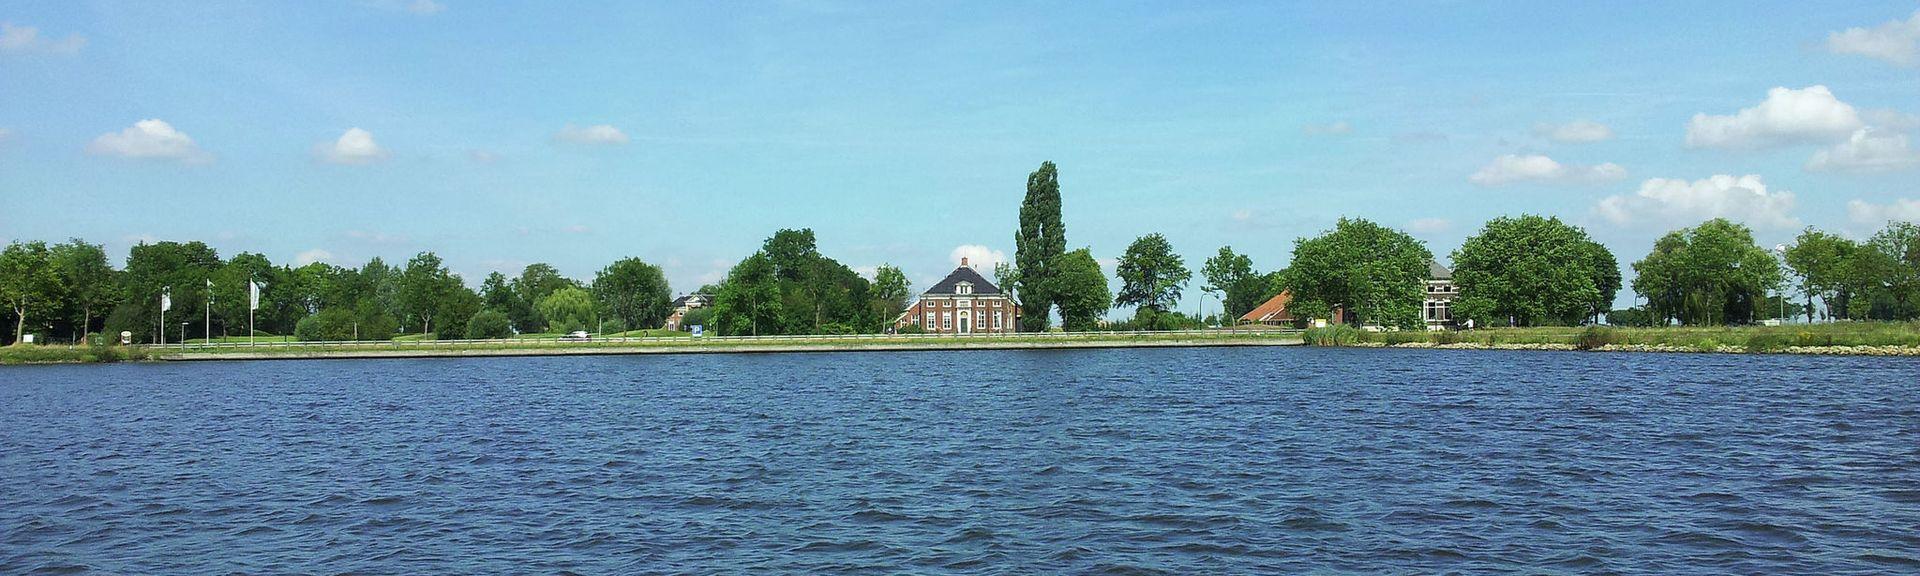 Nieuwolda, Netherlands